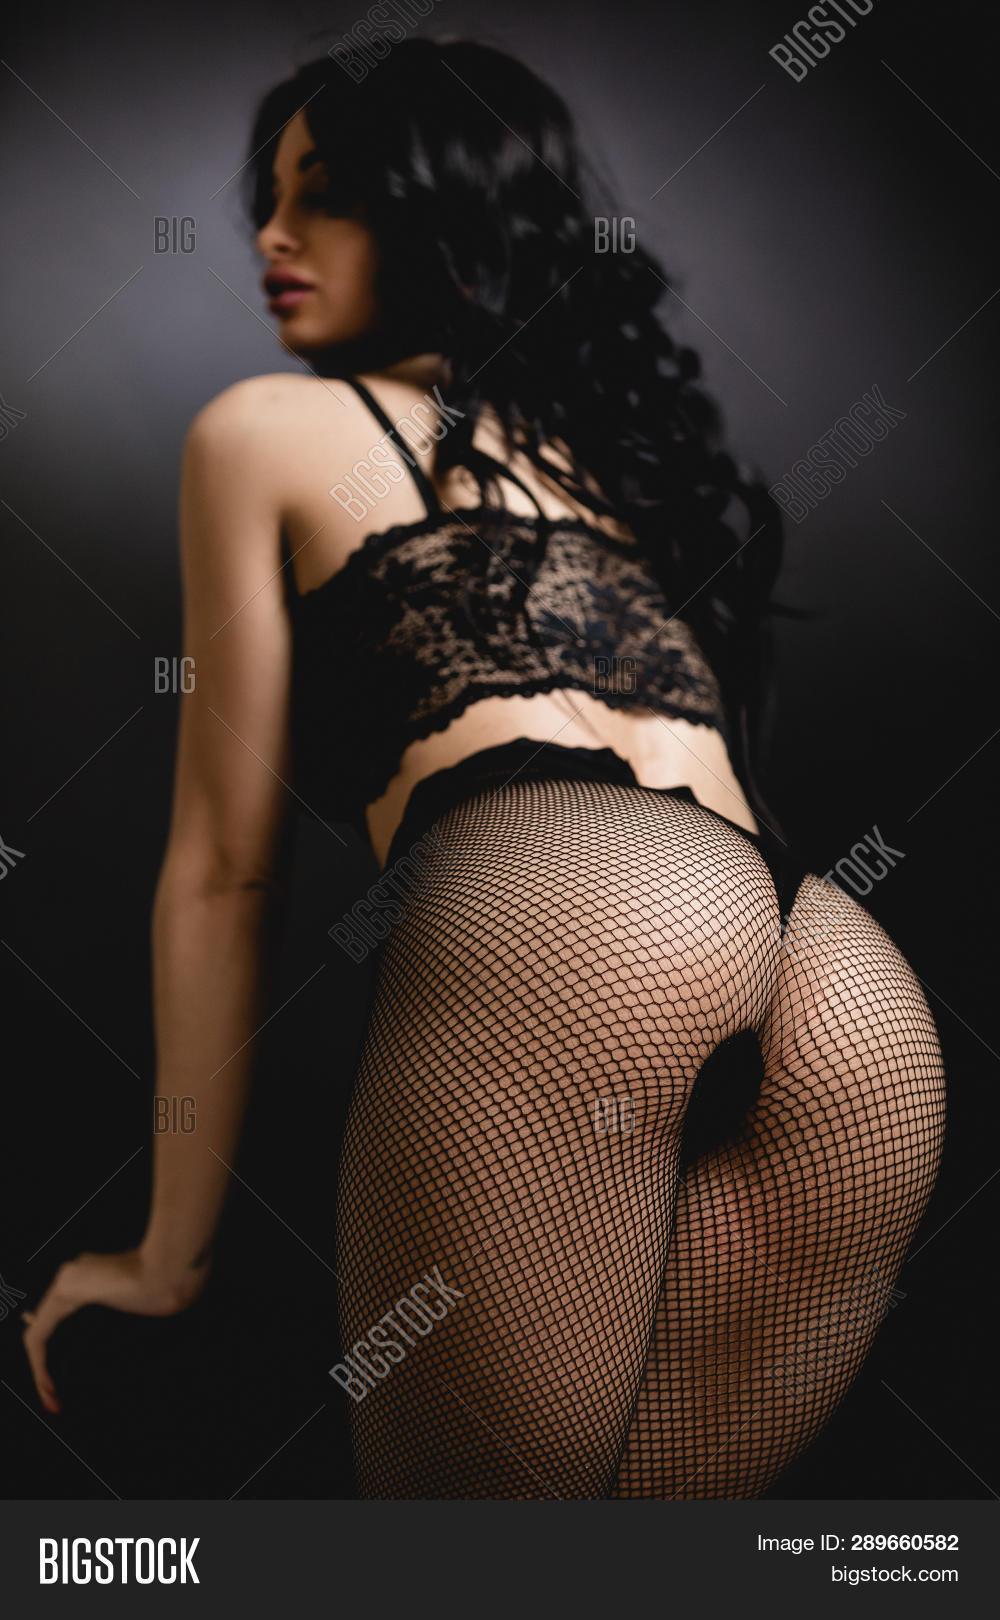 Share sexy big women in stockings ass